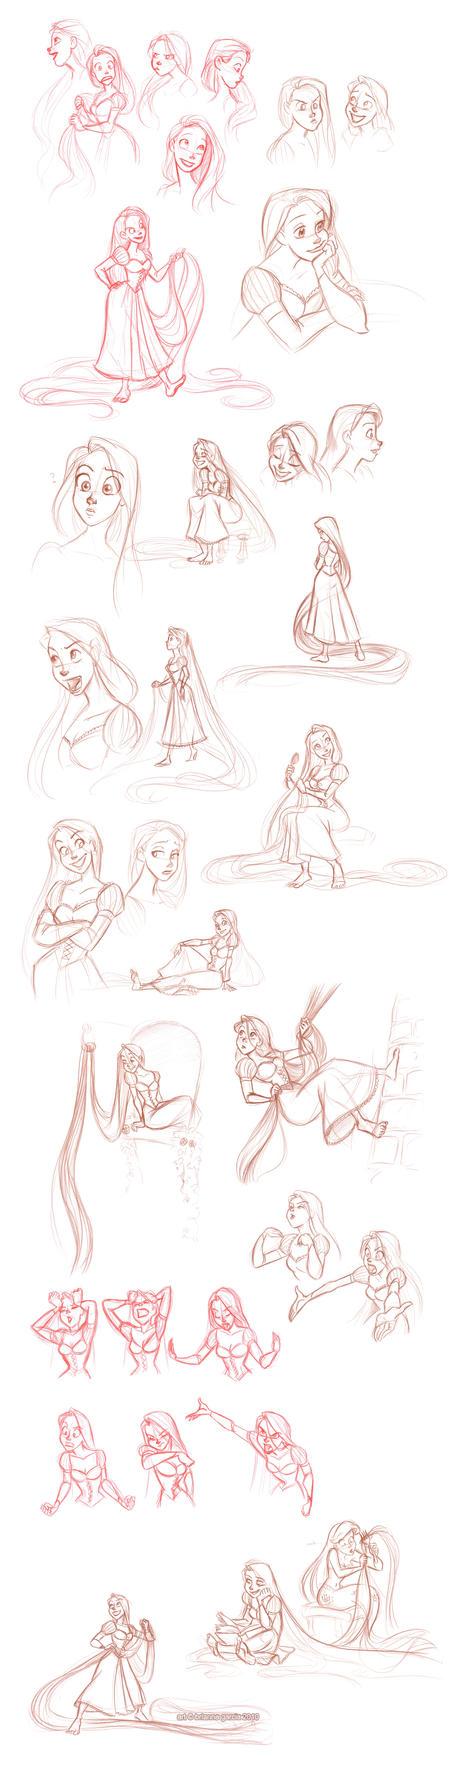 rapunzel sketchdump by...